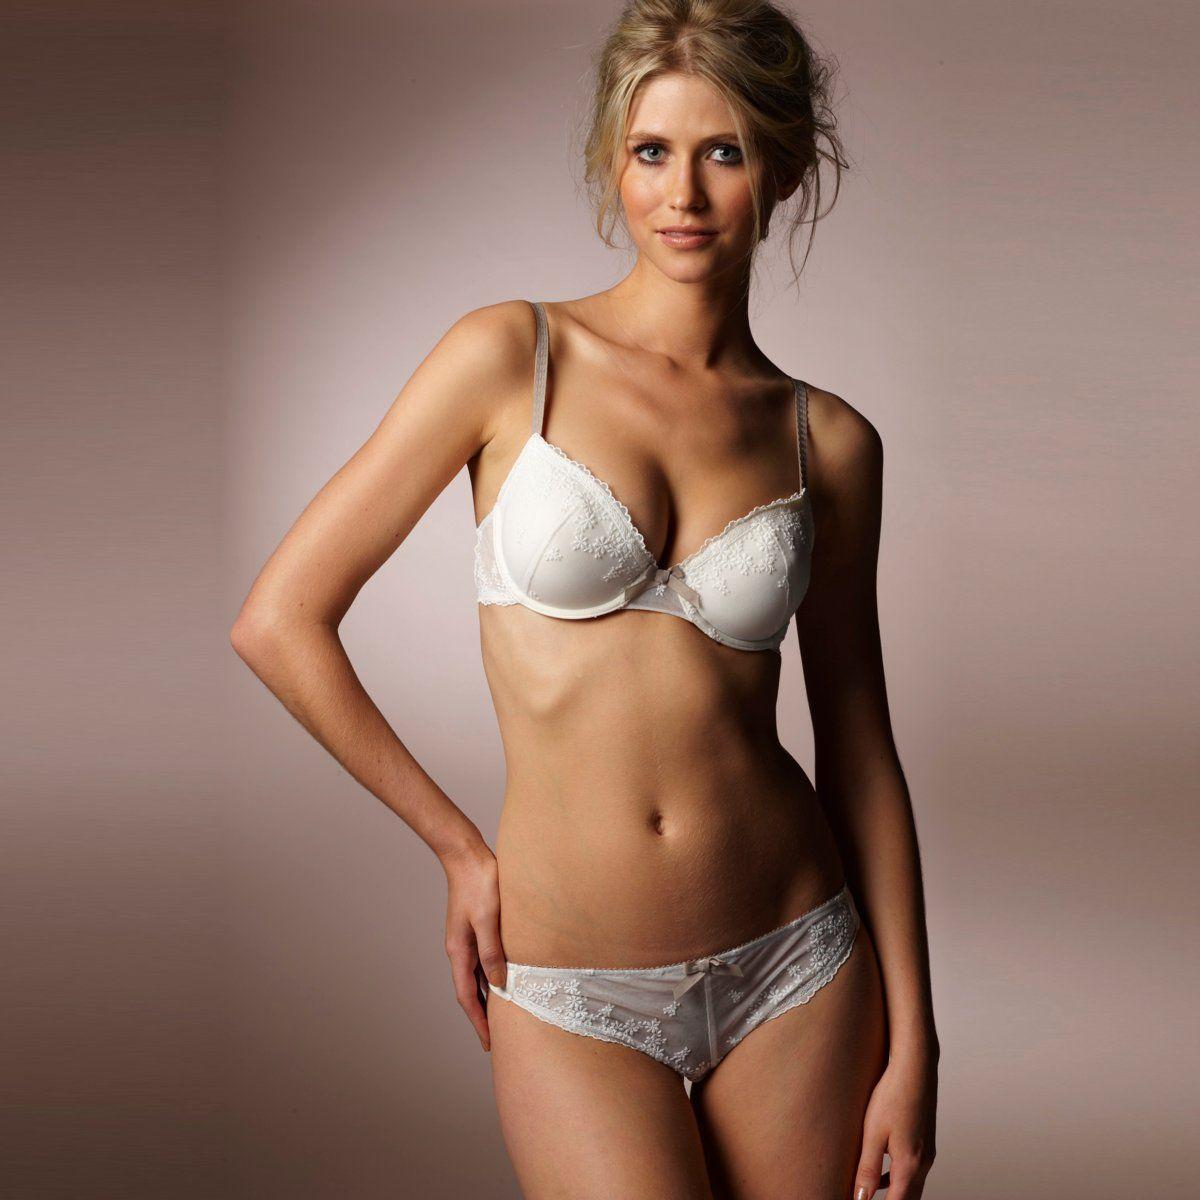 Lingerie | Things Id like to see my girlfriend wear